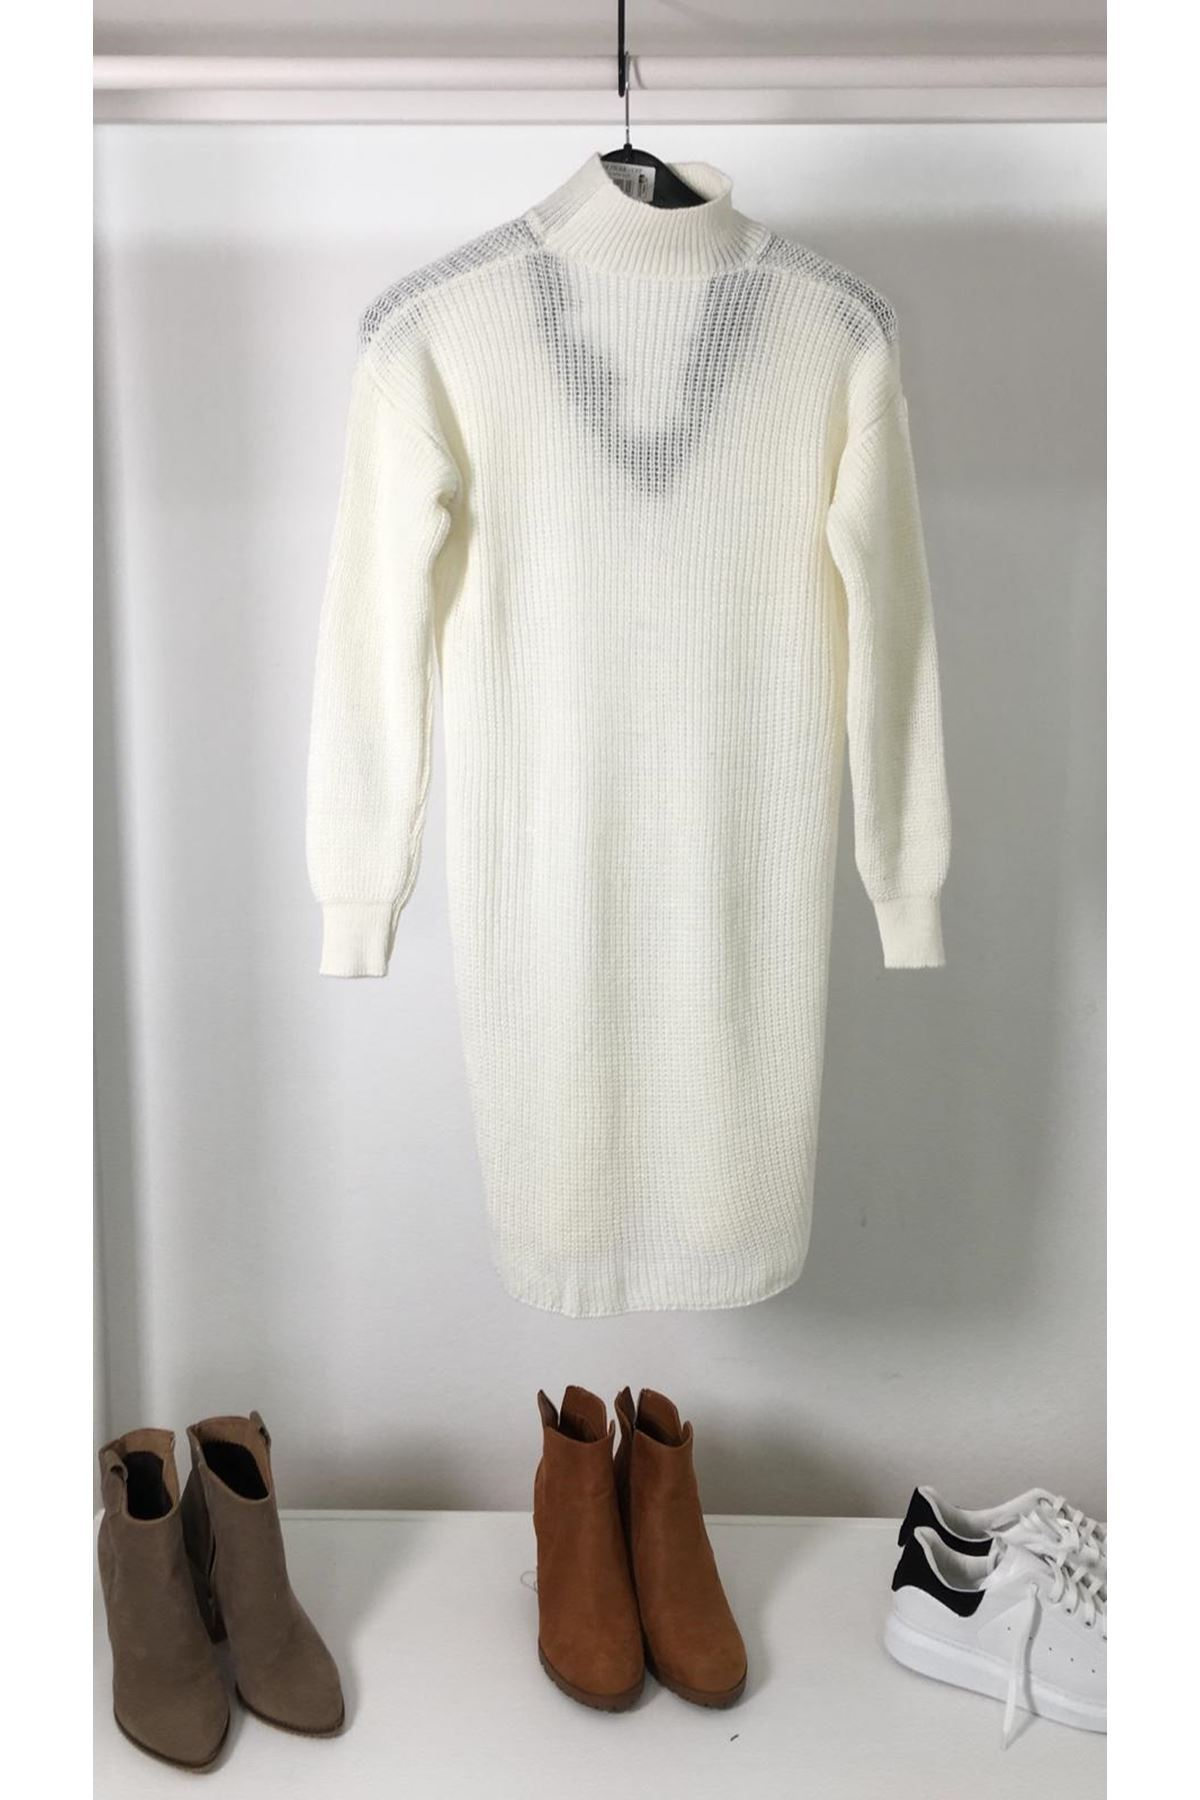 Yaka dantel trıko elbise K25 EKRU